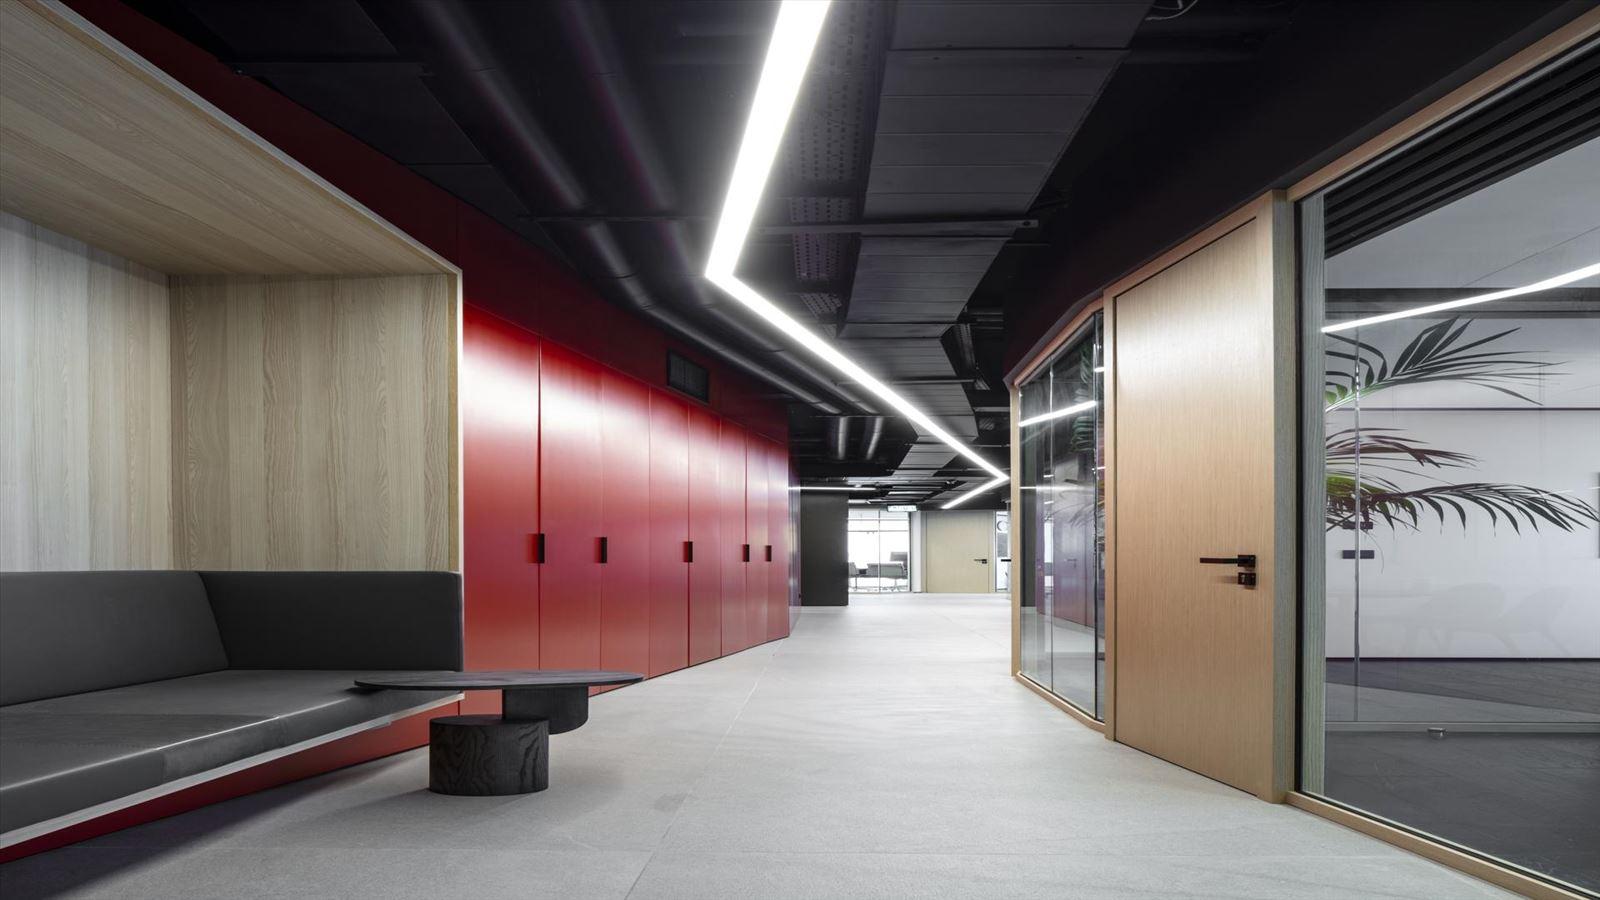 Fortissimo Offices – Tel Aviv אורך מסדרון המשרד בגוף תאורה בעיצוב דורי קמחי